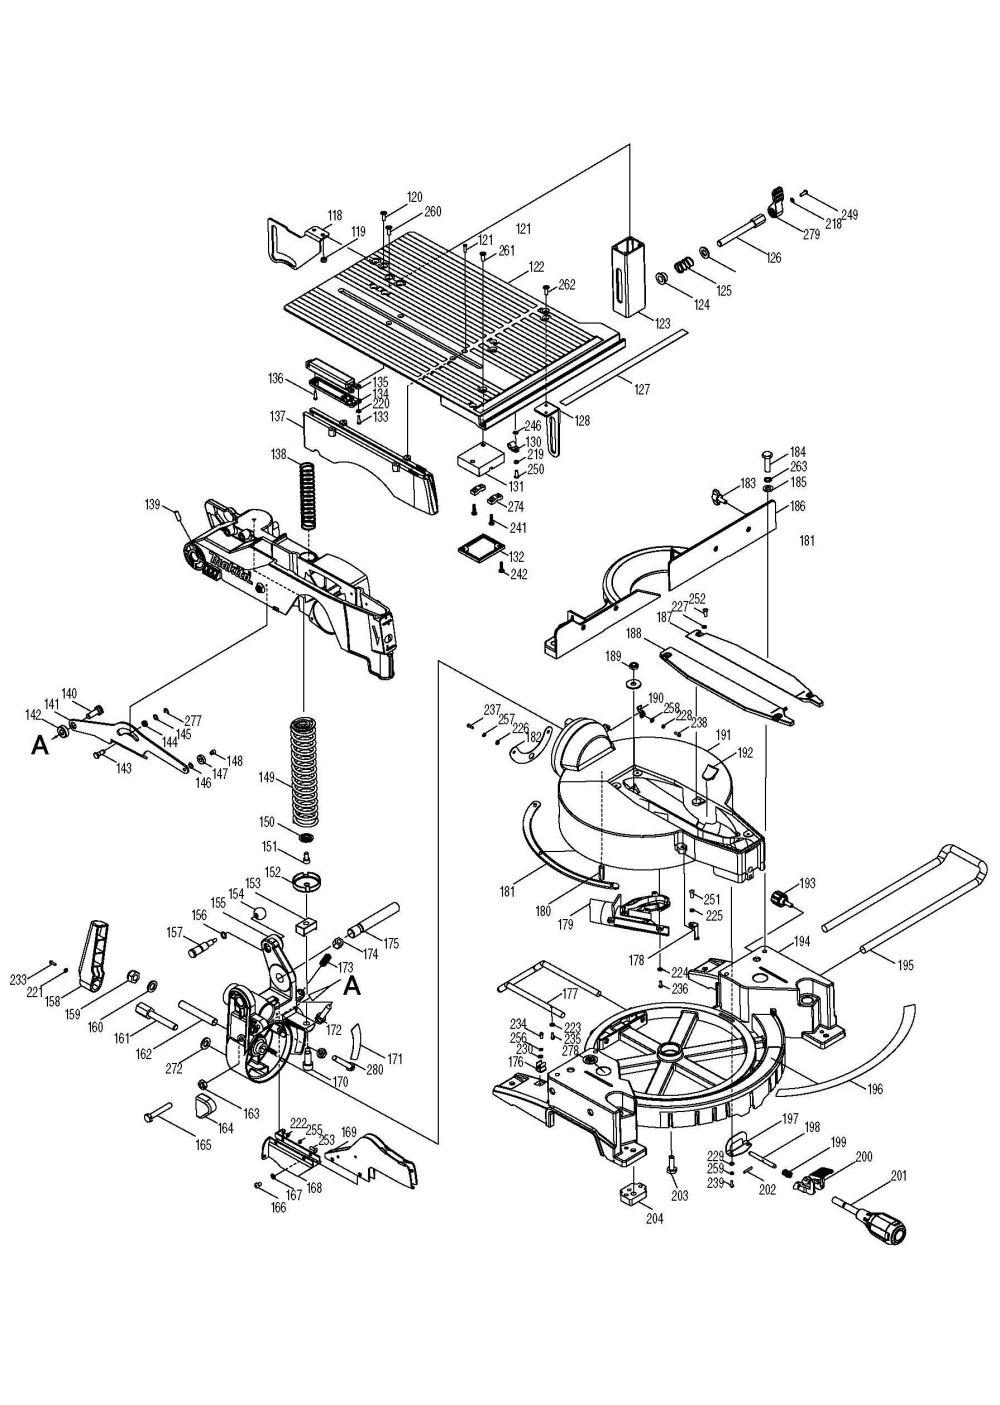 medium resolution of wiring diagrams milwaukee power tools milwaukee tools amazon makita angle grinder makita 4 inch angle grinder